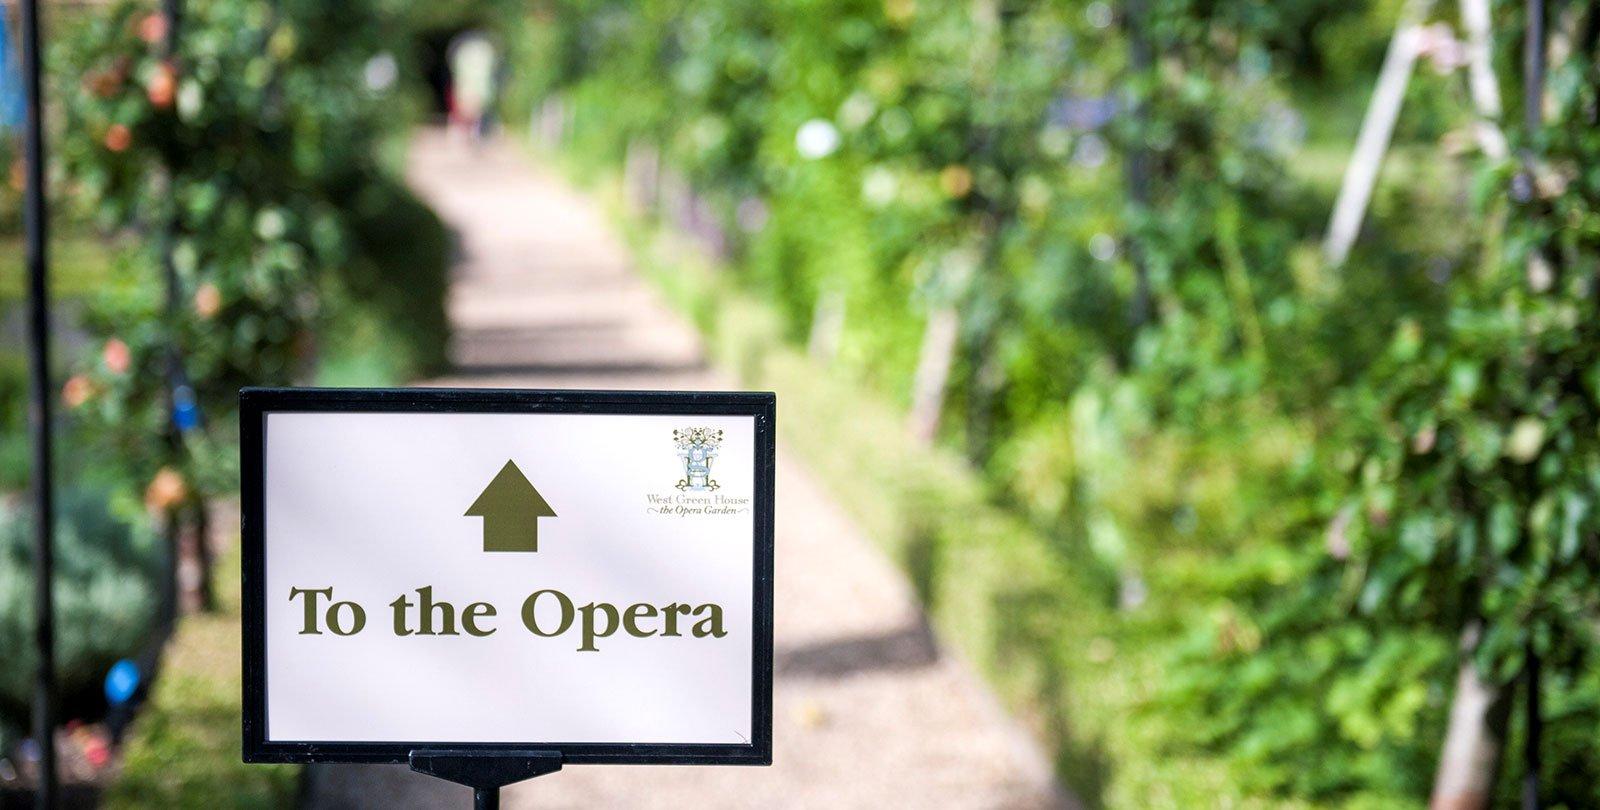 The Aria Club opera sign